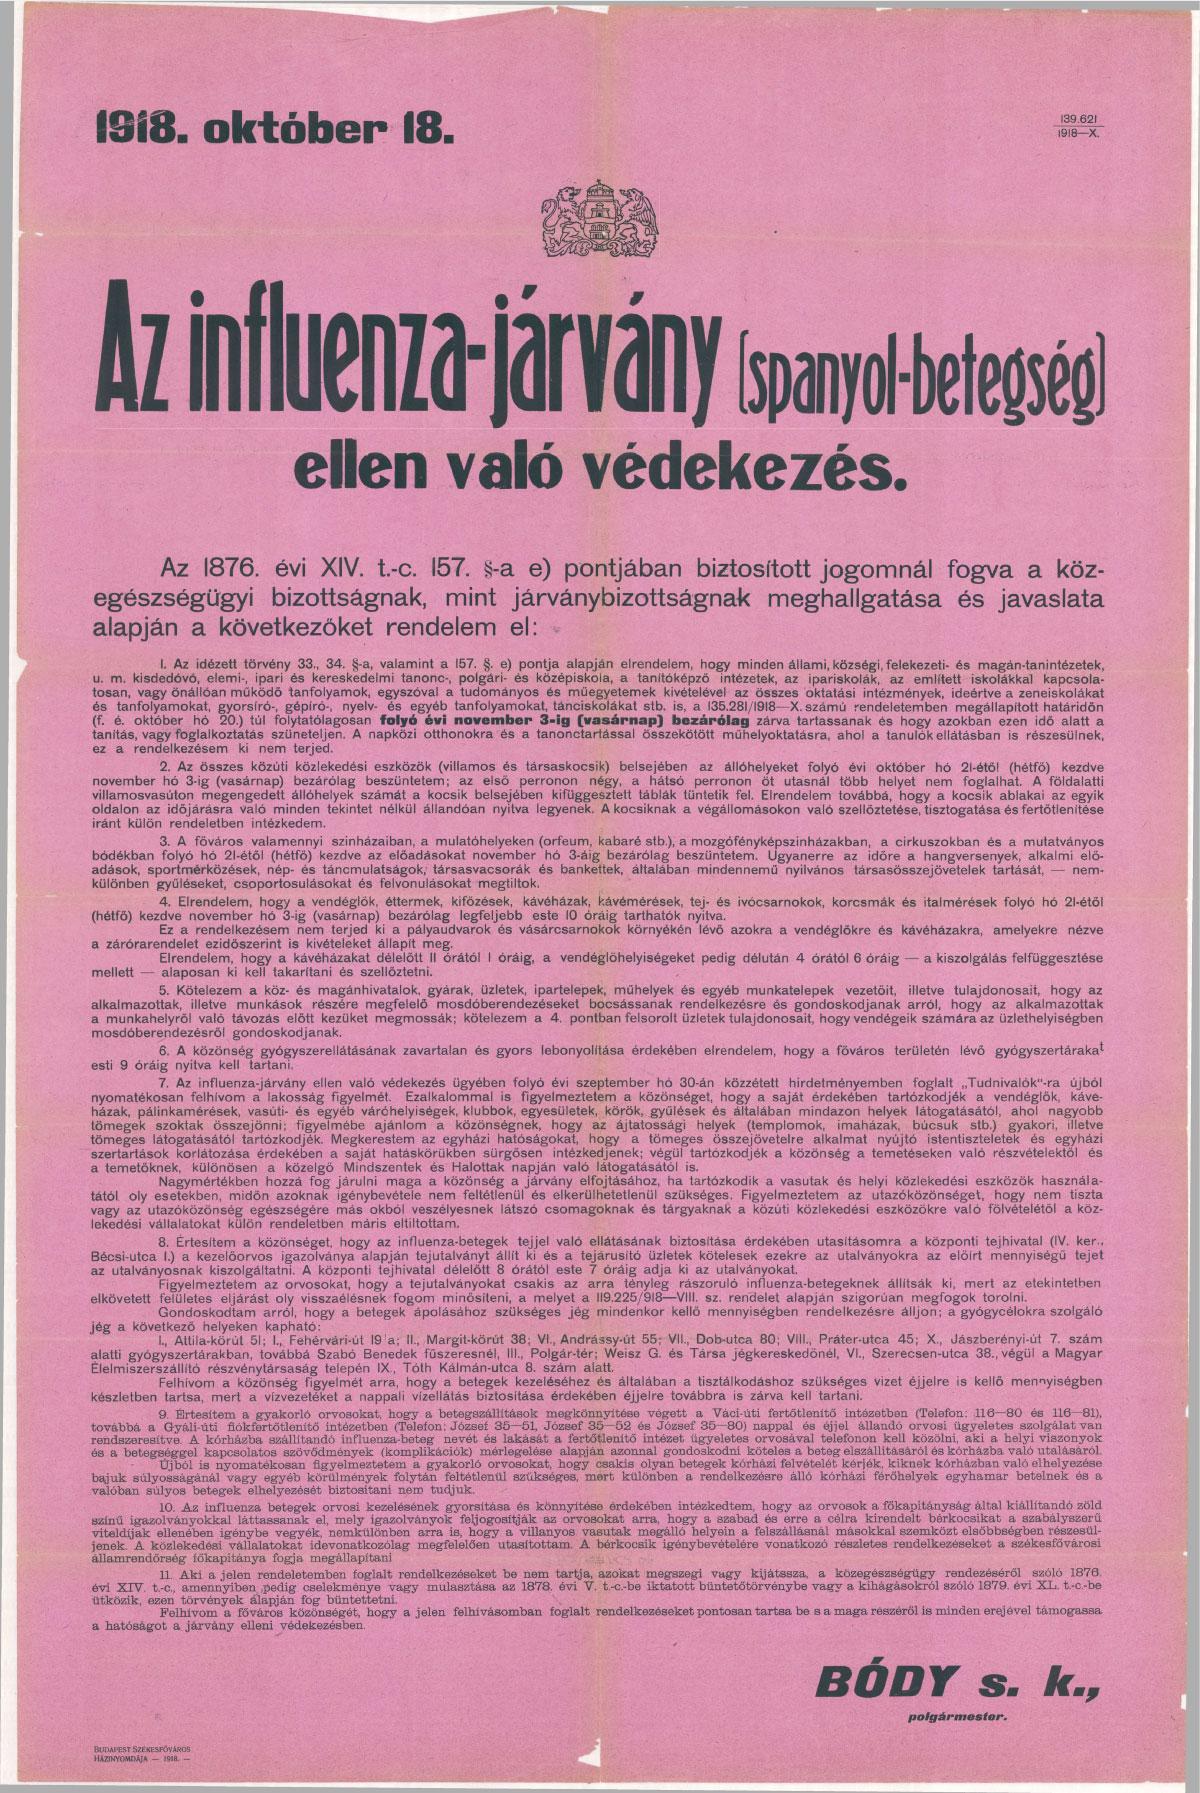 1918_influenza.jpg